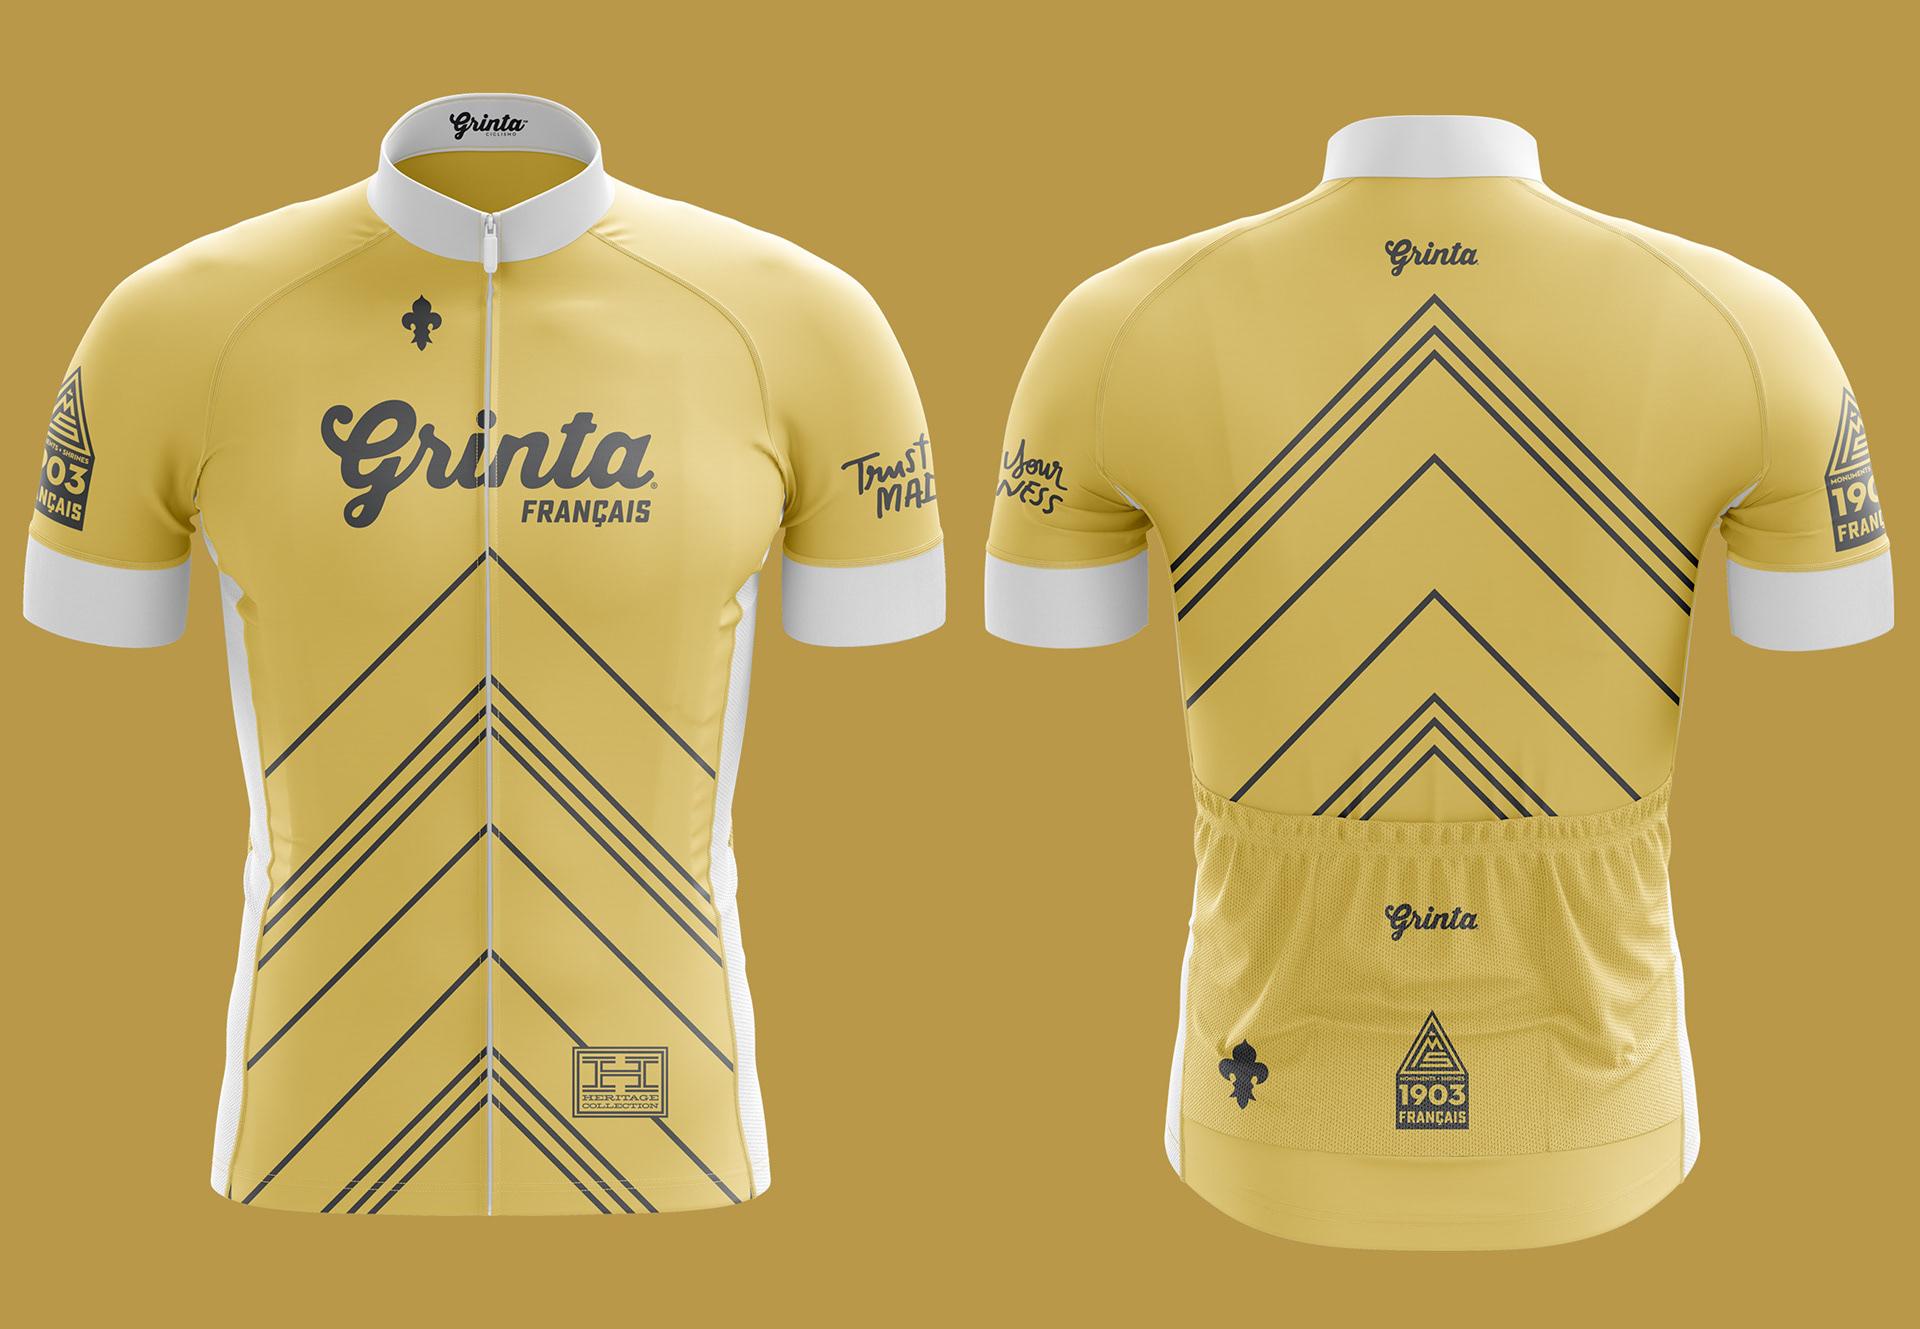 grinta-jerseys-yellow-france-tour.jpg